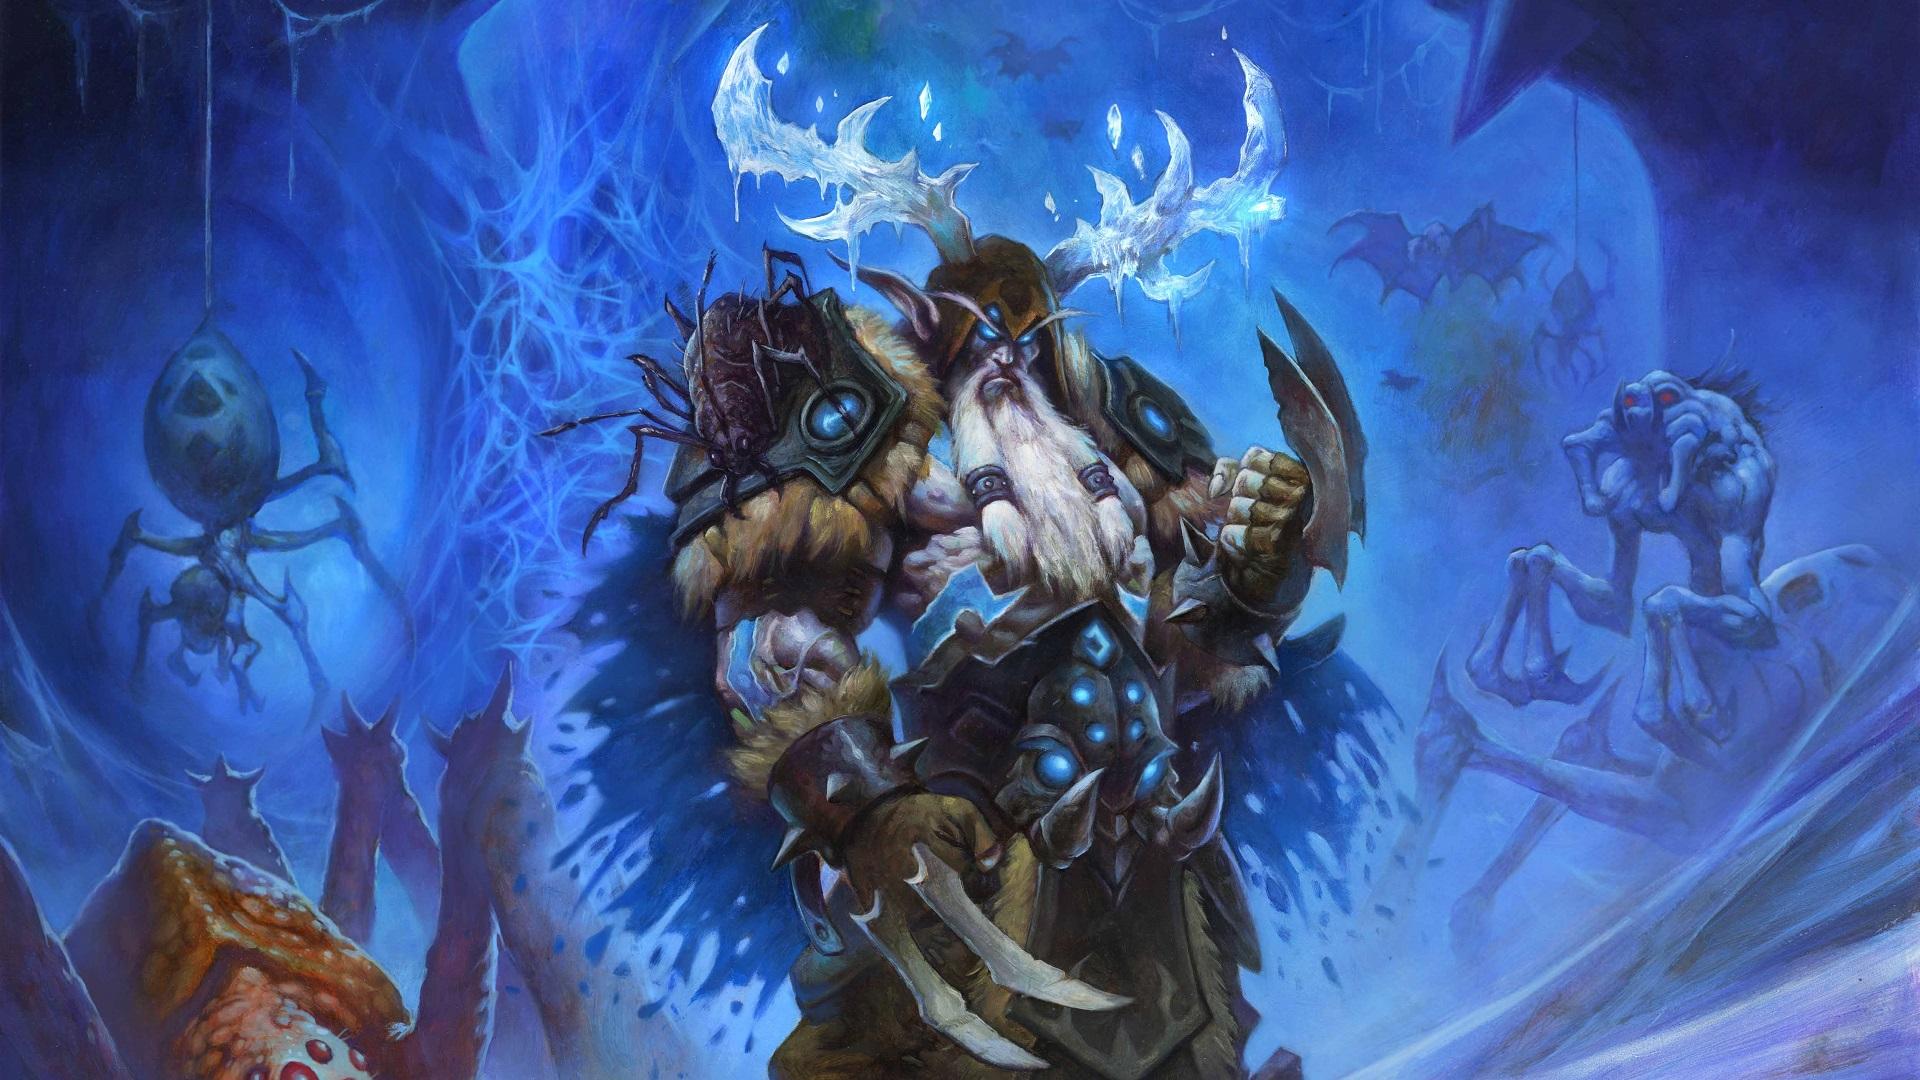 Wallpaper Hearthstone Heroes Of Warcraft Cards Artwork